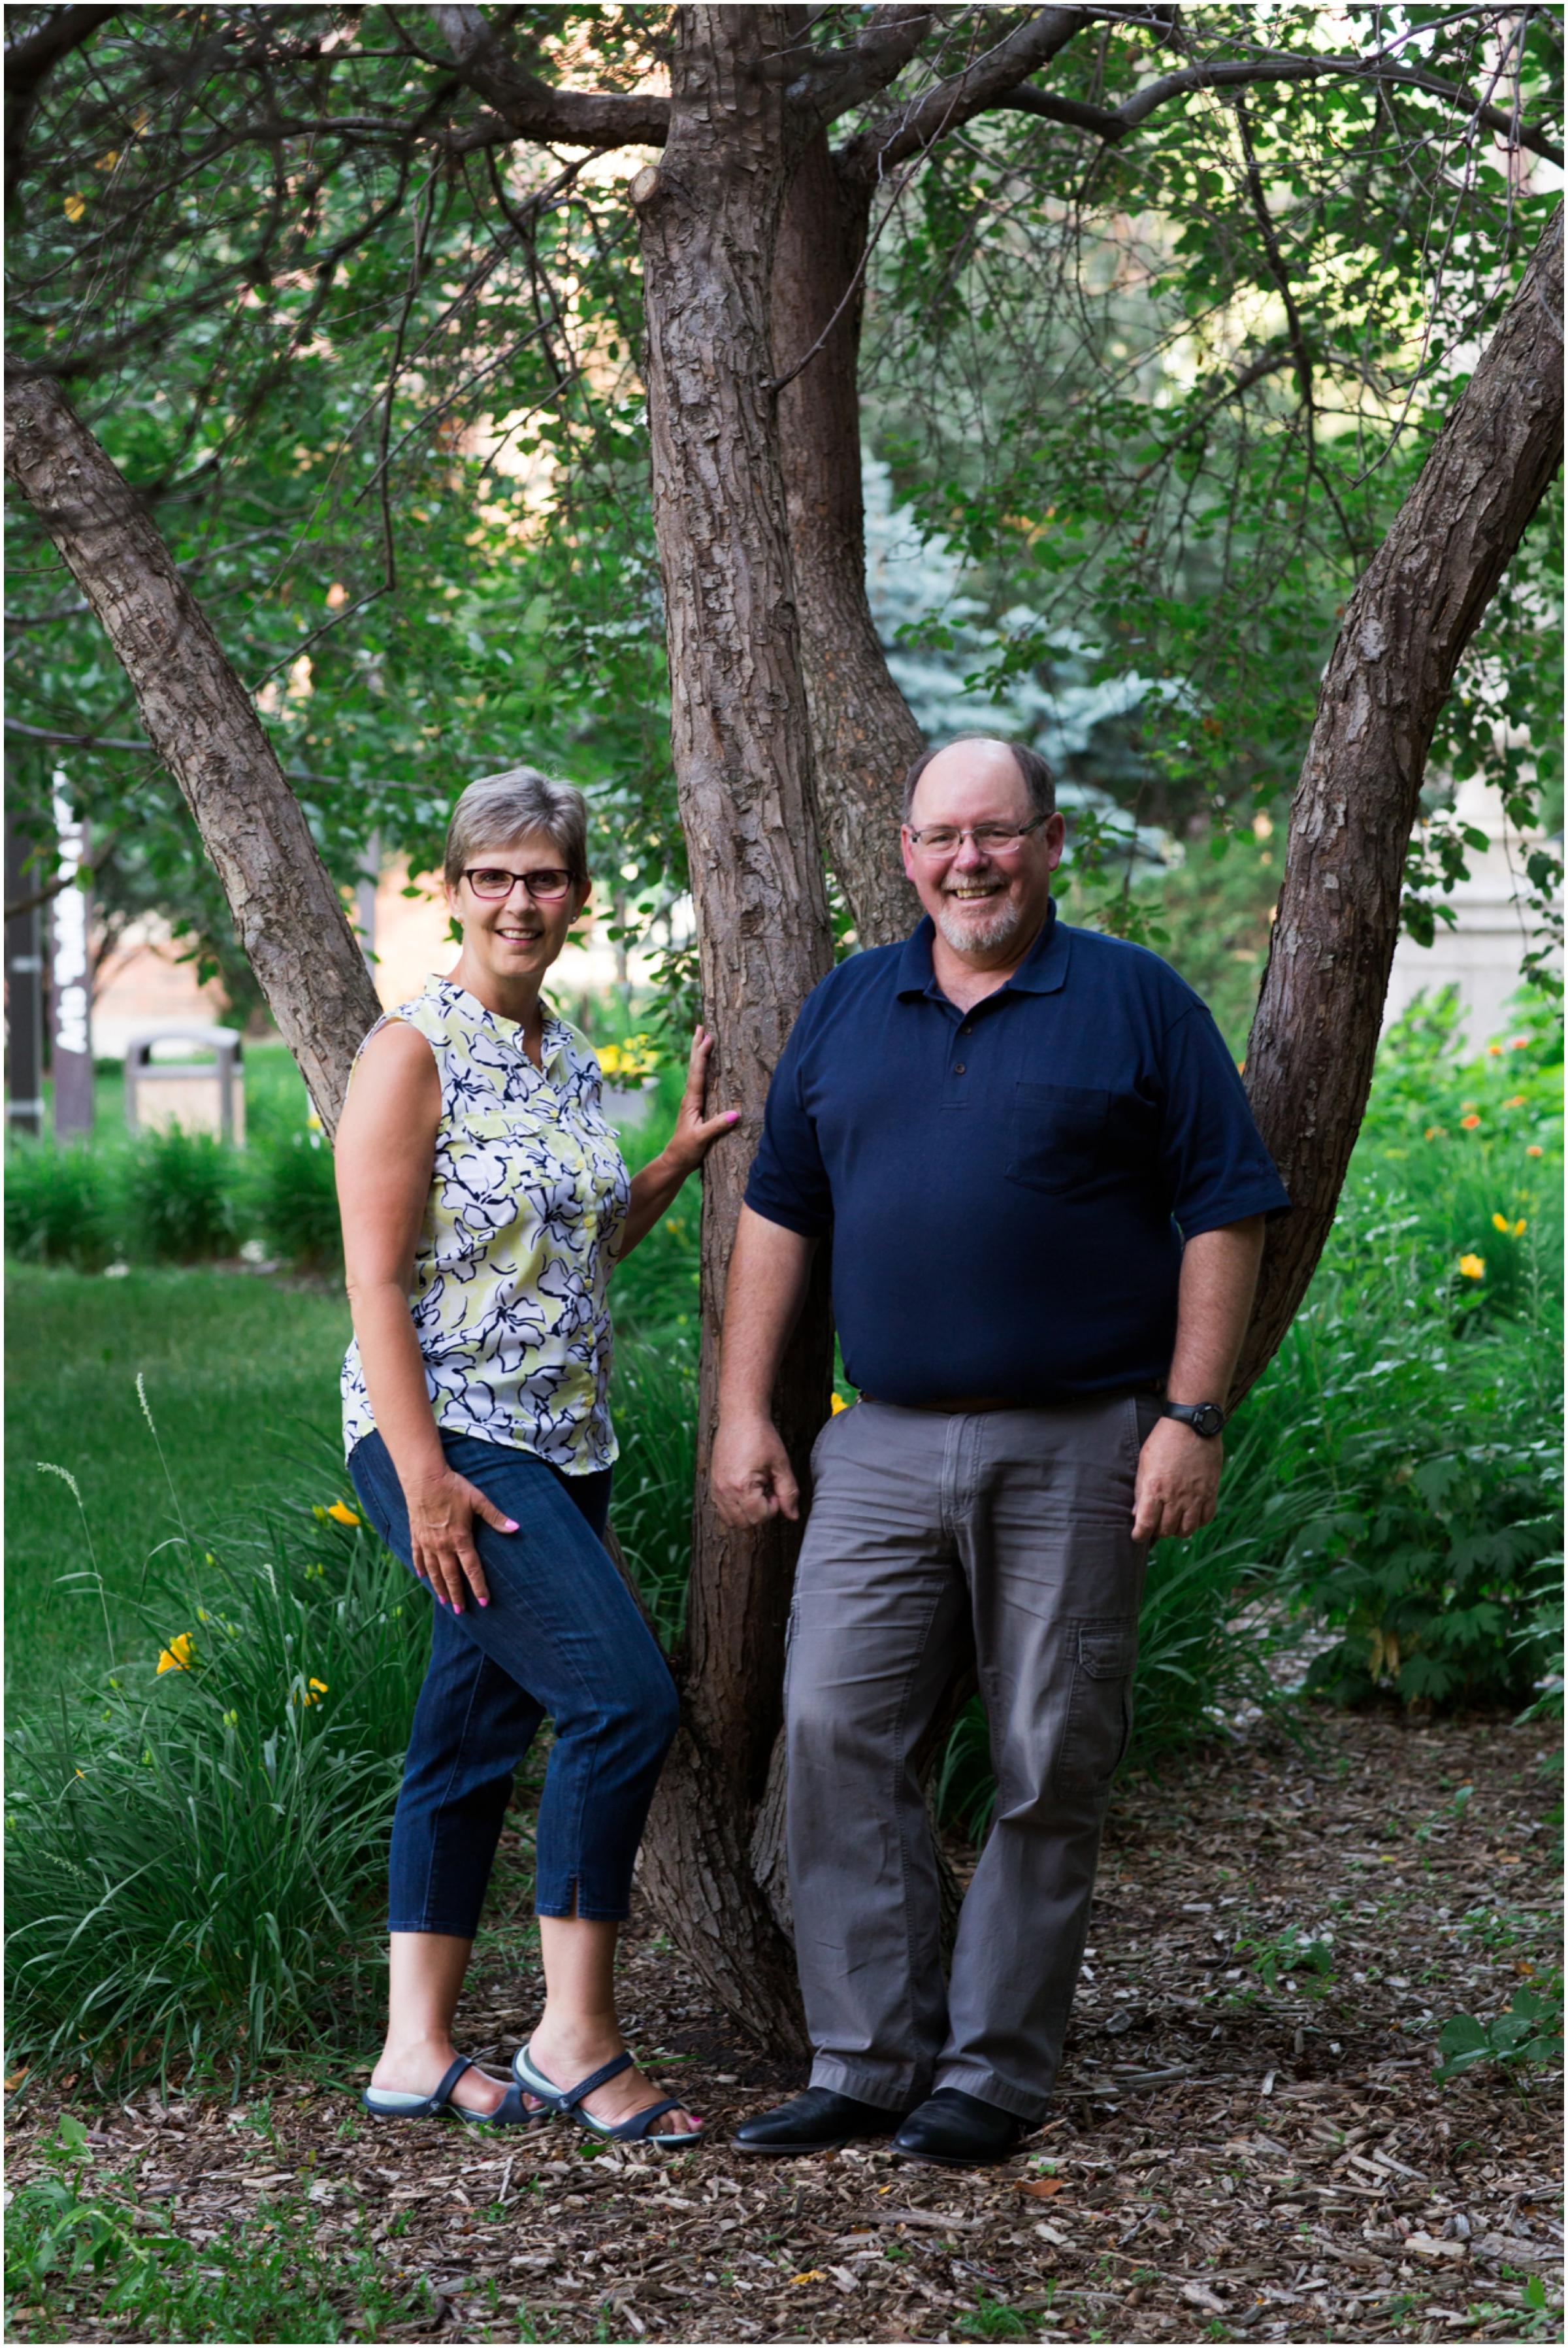 Edmonton Family Photo Session - (Selena Phillips-Boyle)_0022.jpg